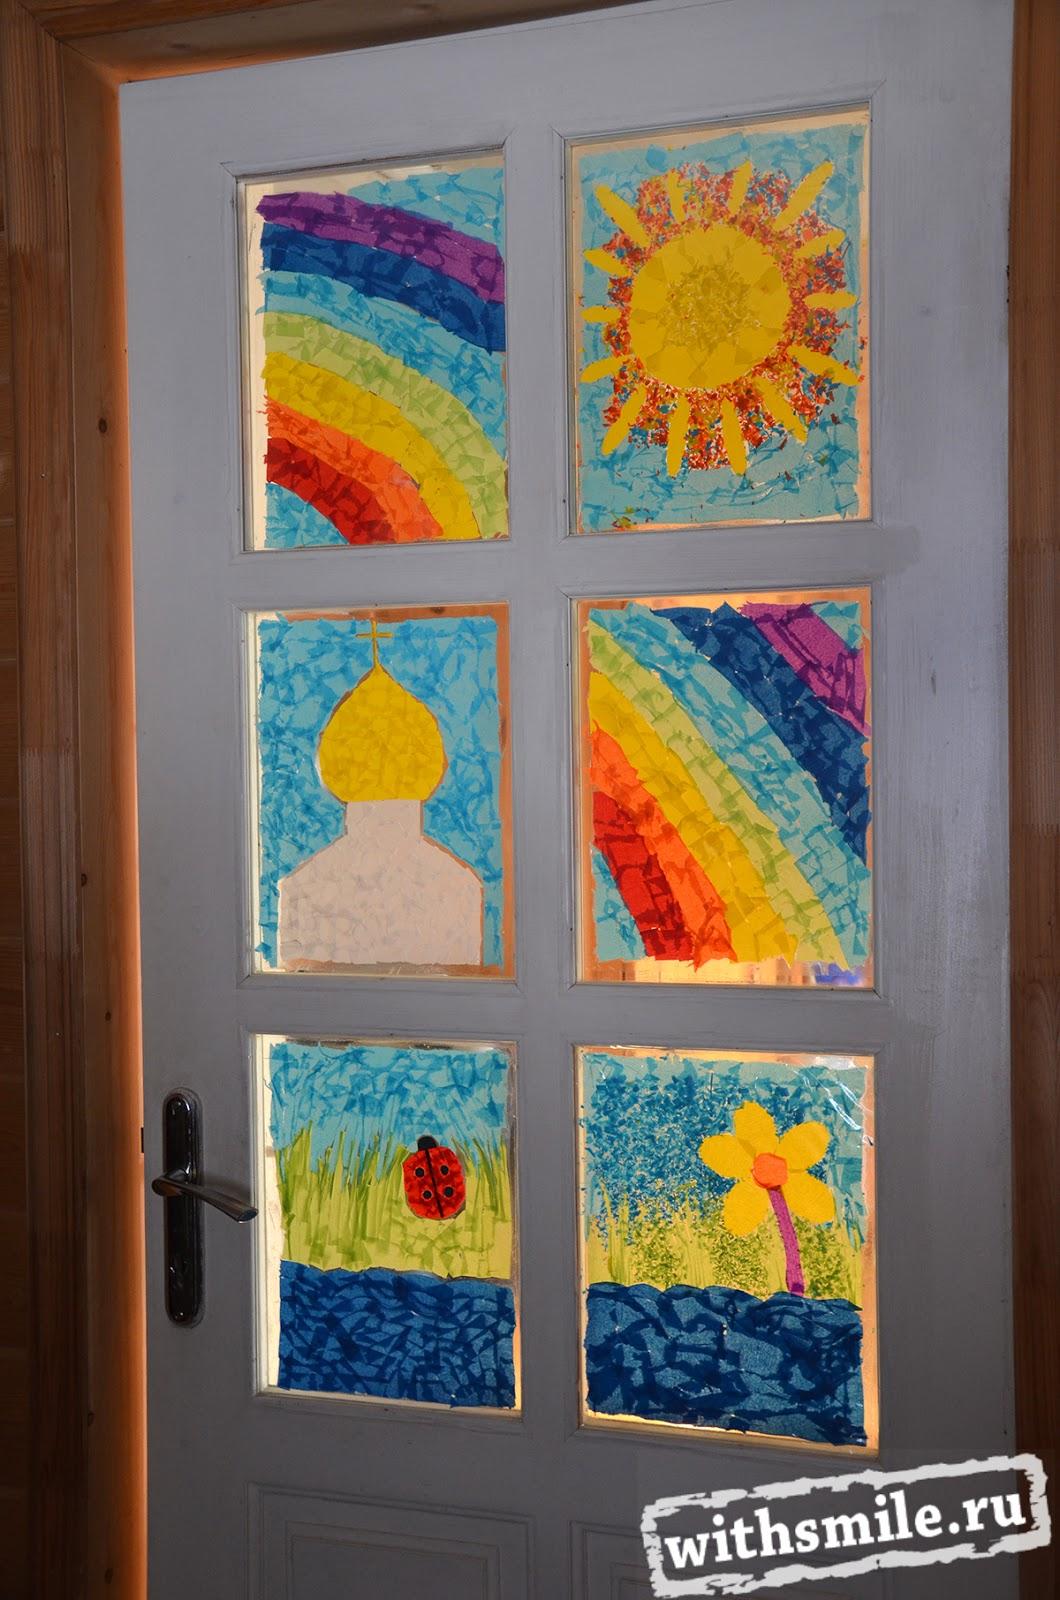 Rainbow. The sun. Ladybug. Flower. Paper. With children.